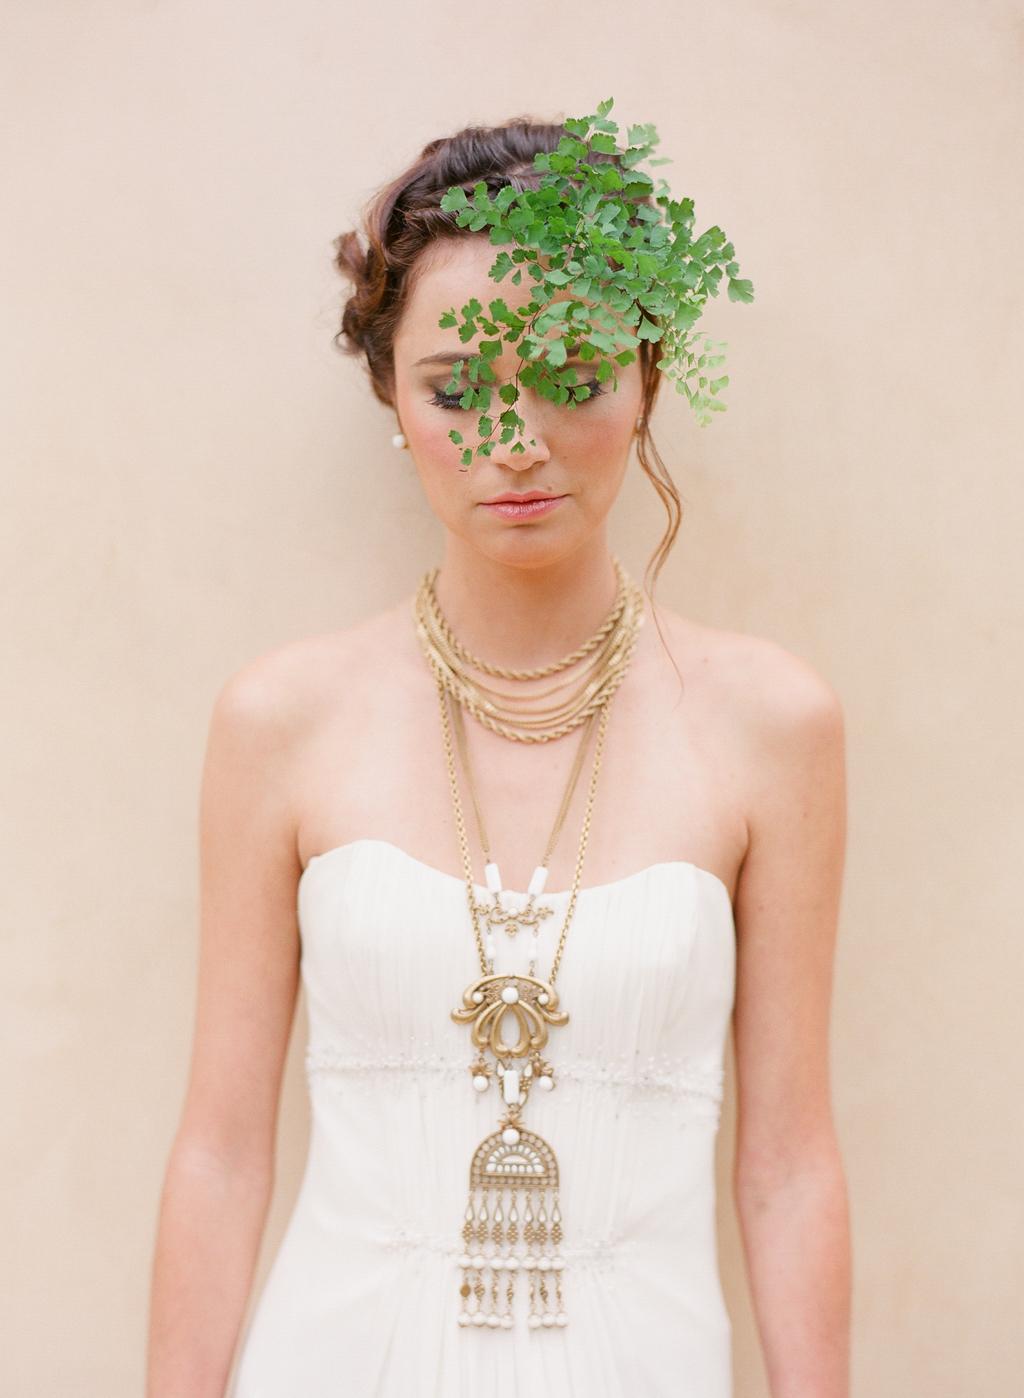 Styled-wedding-santa-barbara-chic-beaux-arts-photographie-italian-bohemian-wedding-bride-wedding-dress-white-073.full